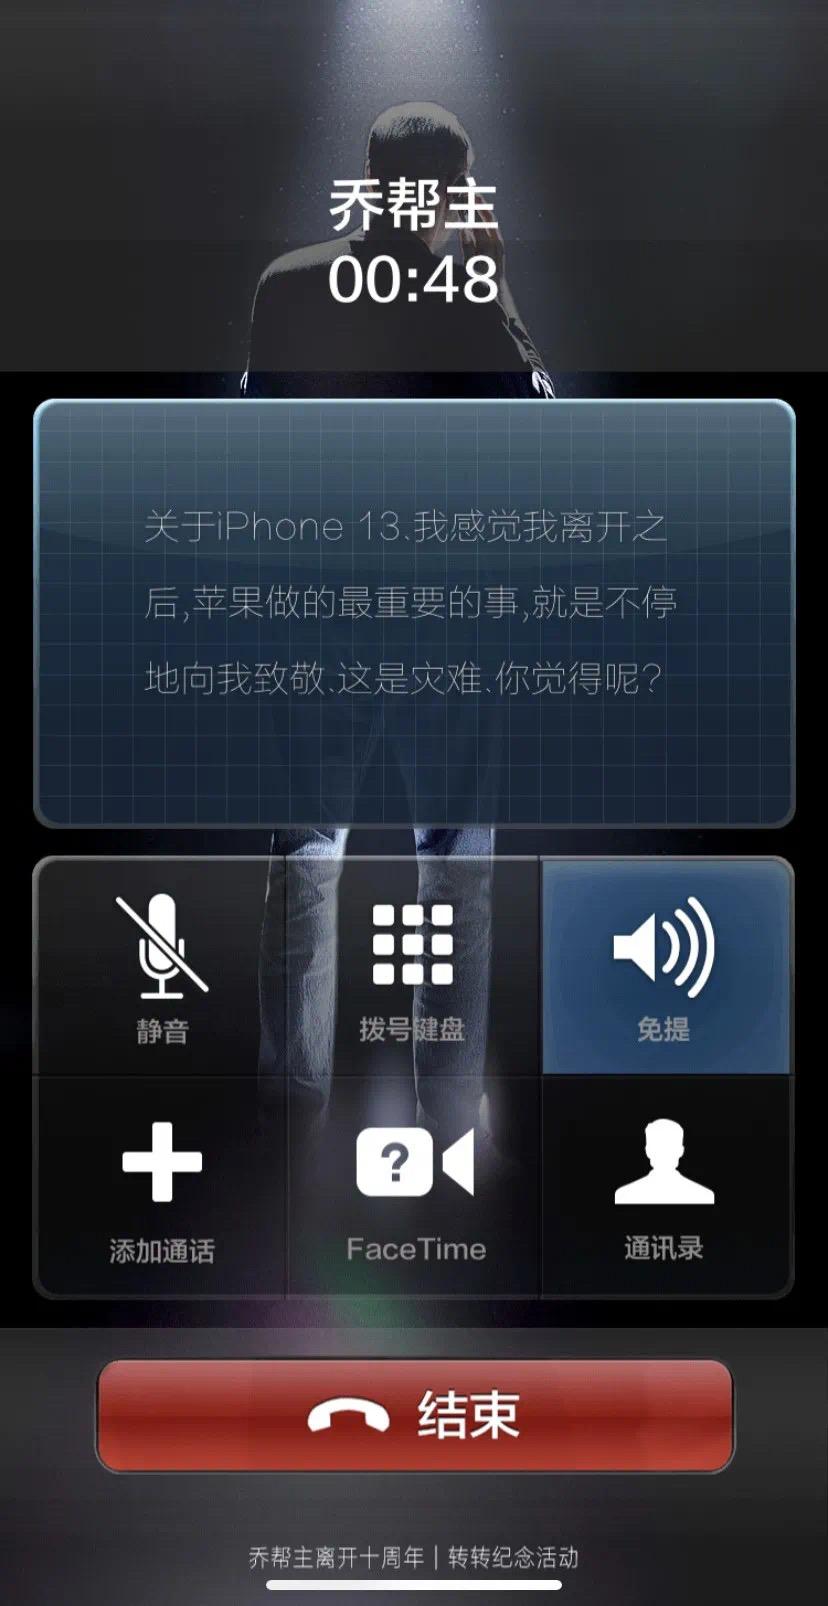 9.1iphone13.jpg